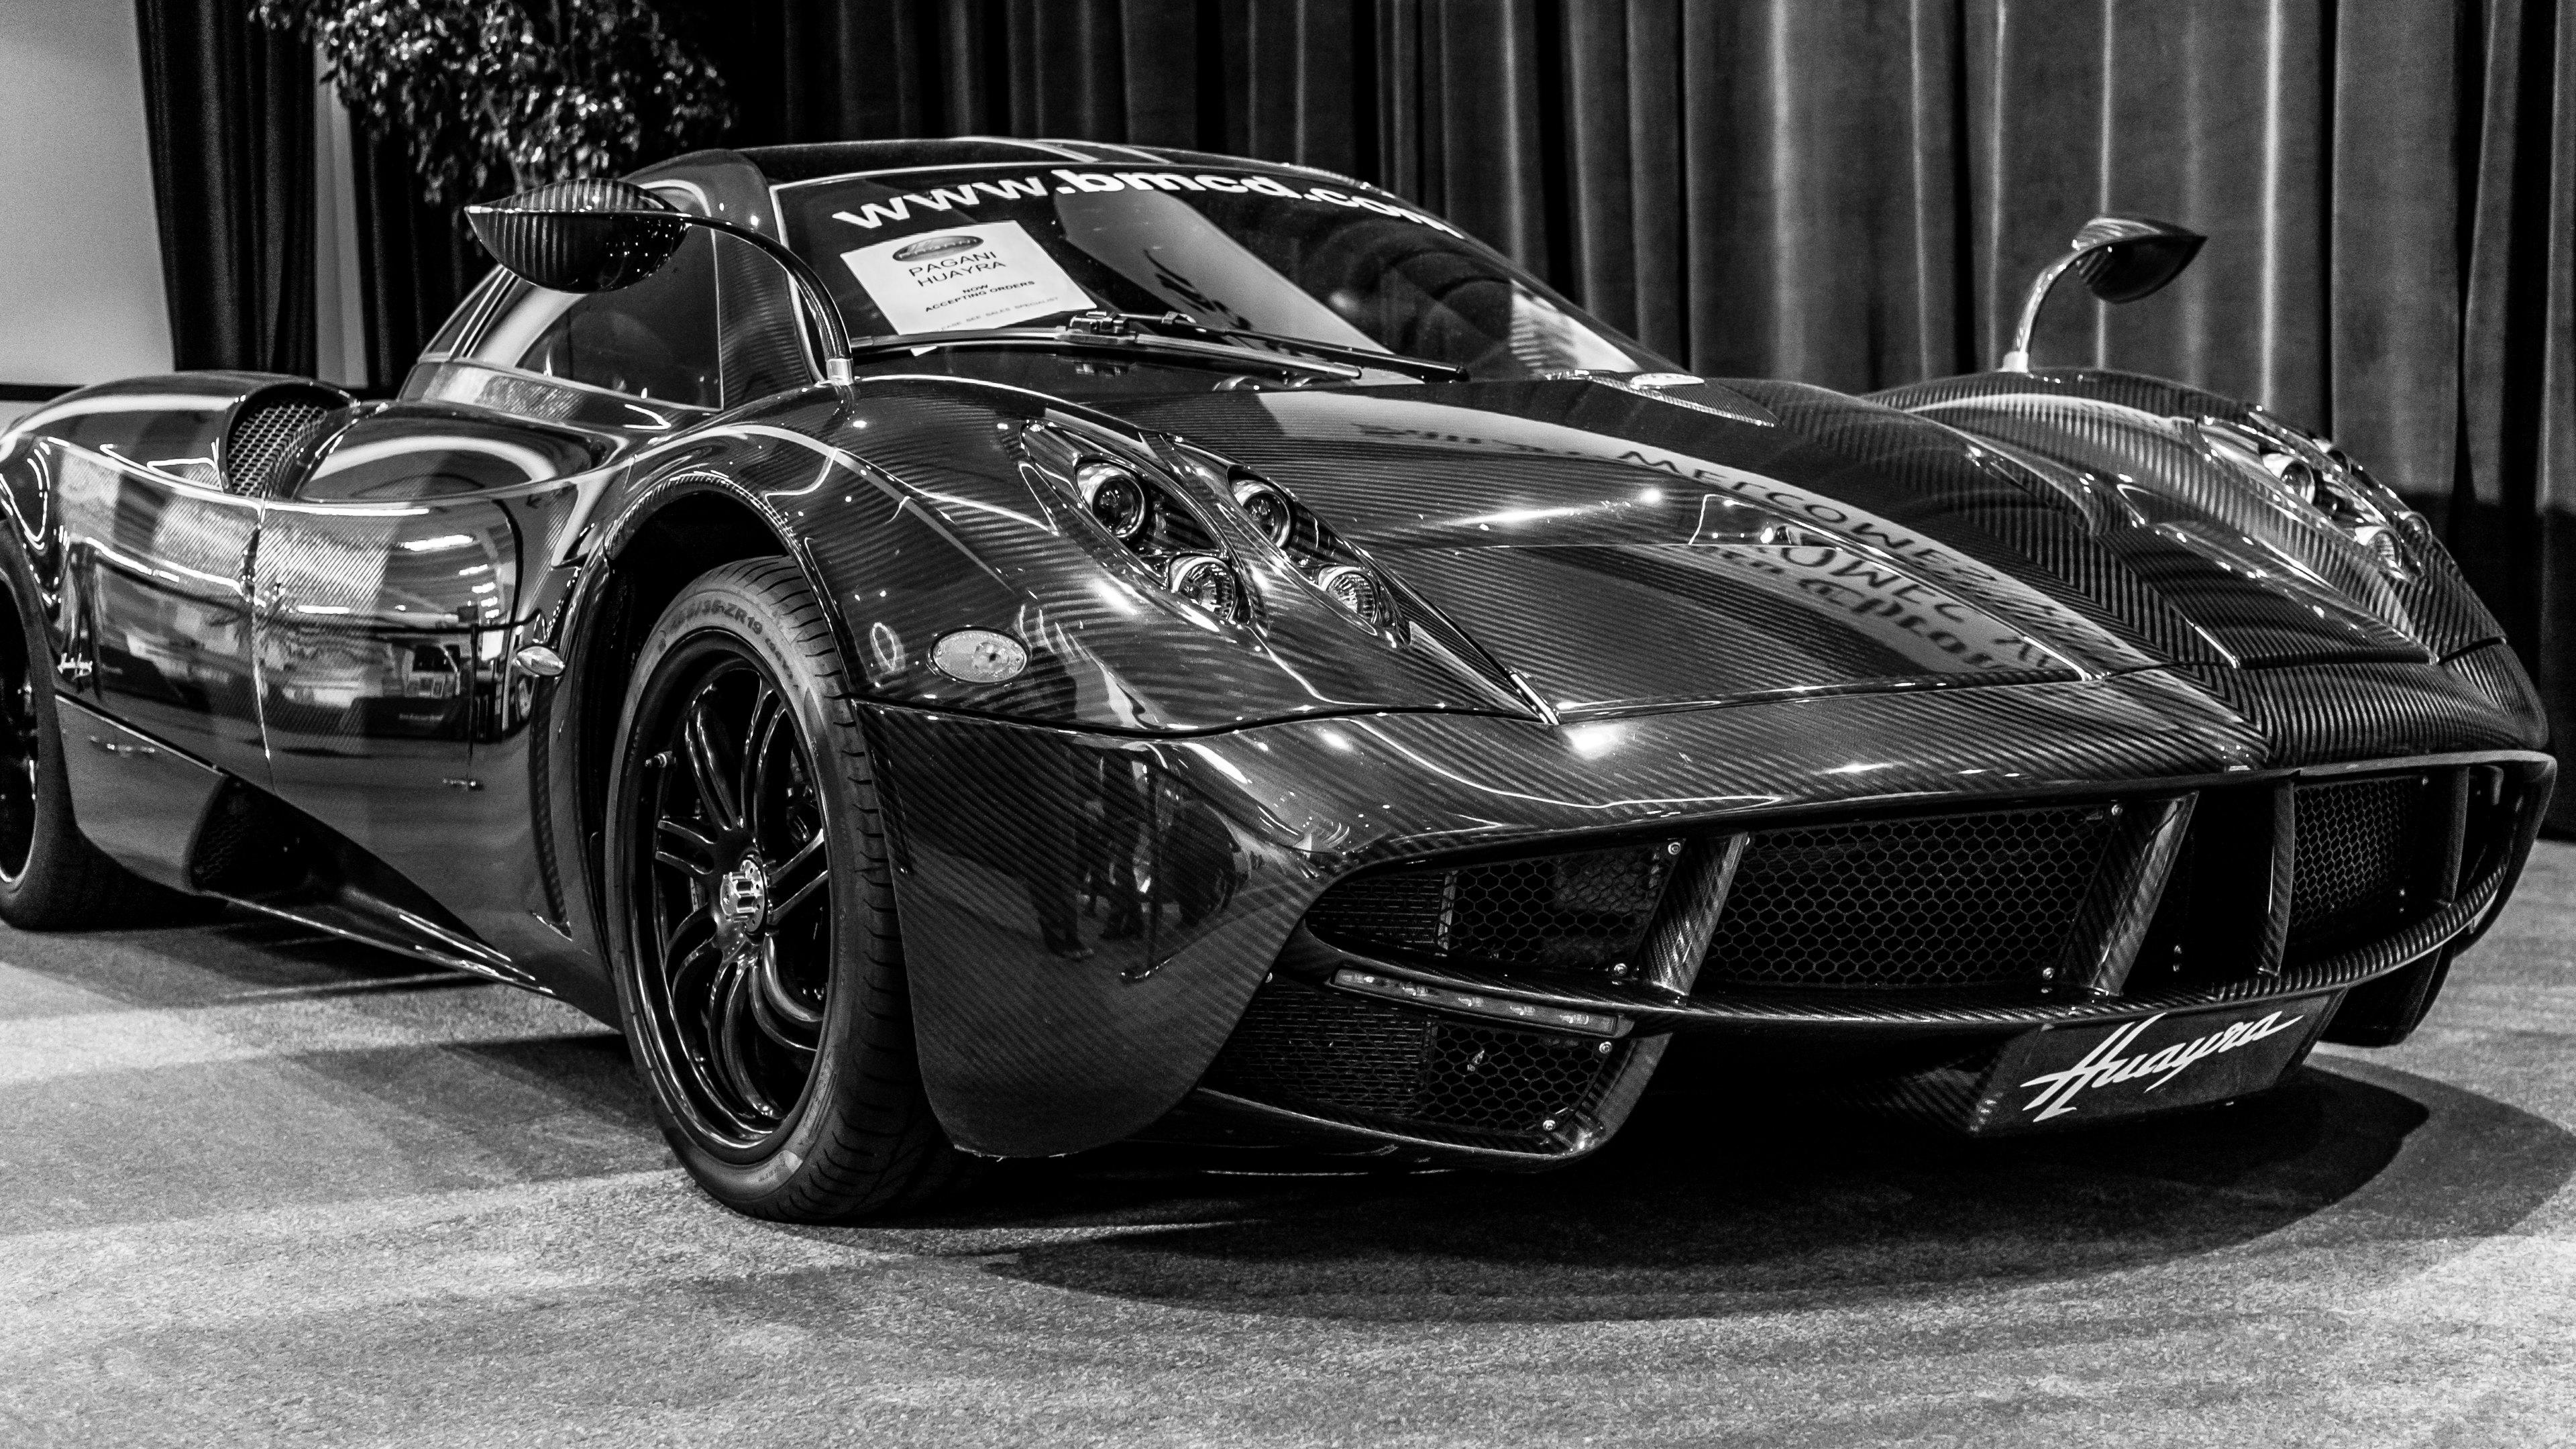 Pagani_Huayra_uhd Interesting Bugatti Veyron Grand Sport Vitesse Vs Pagani Huayra Cars Trend